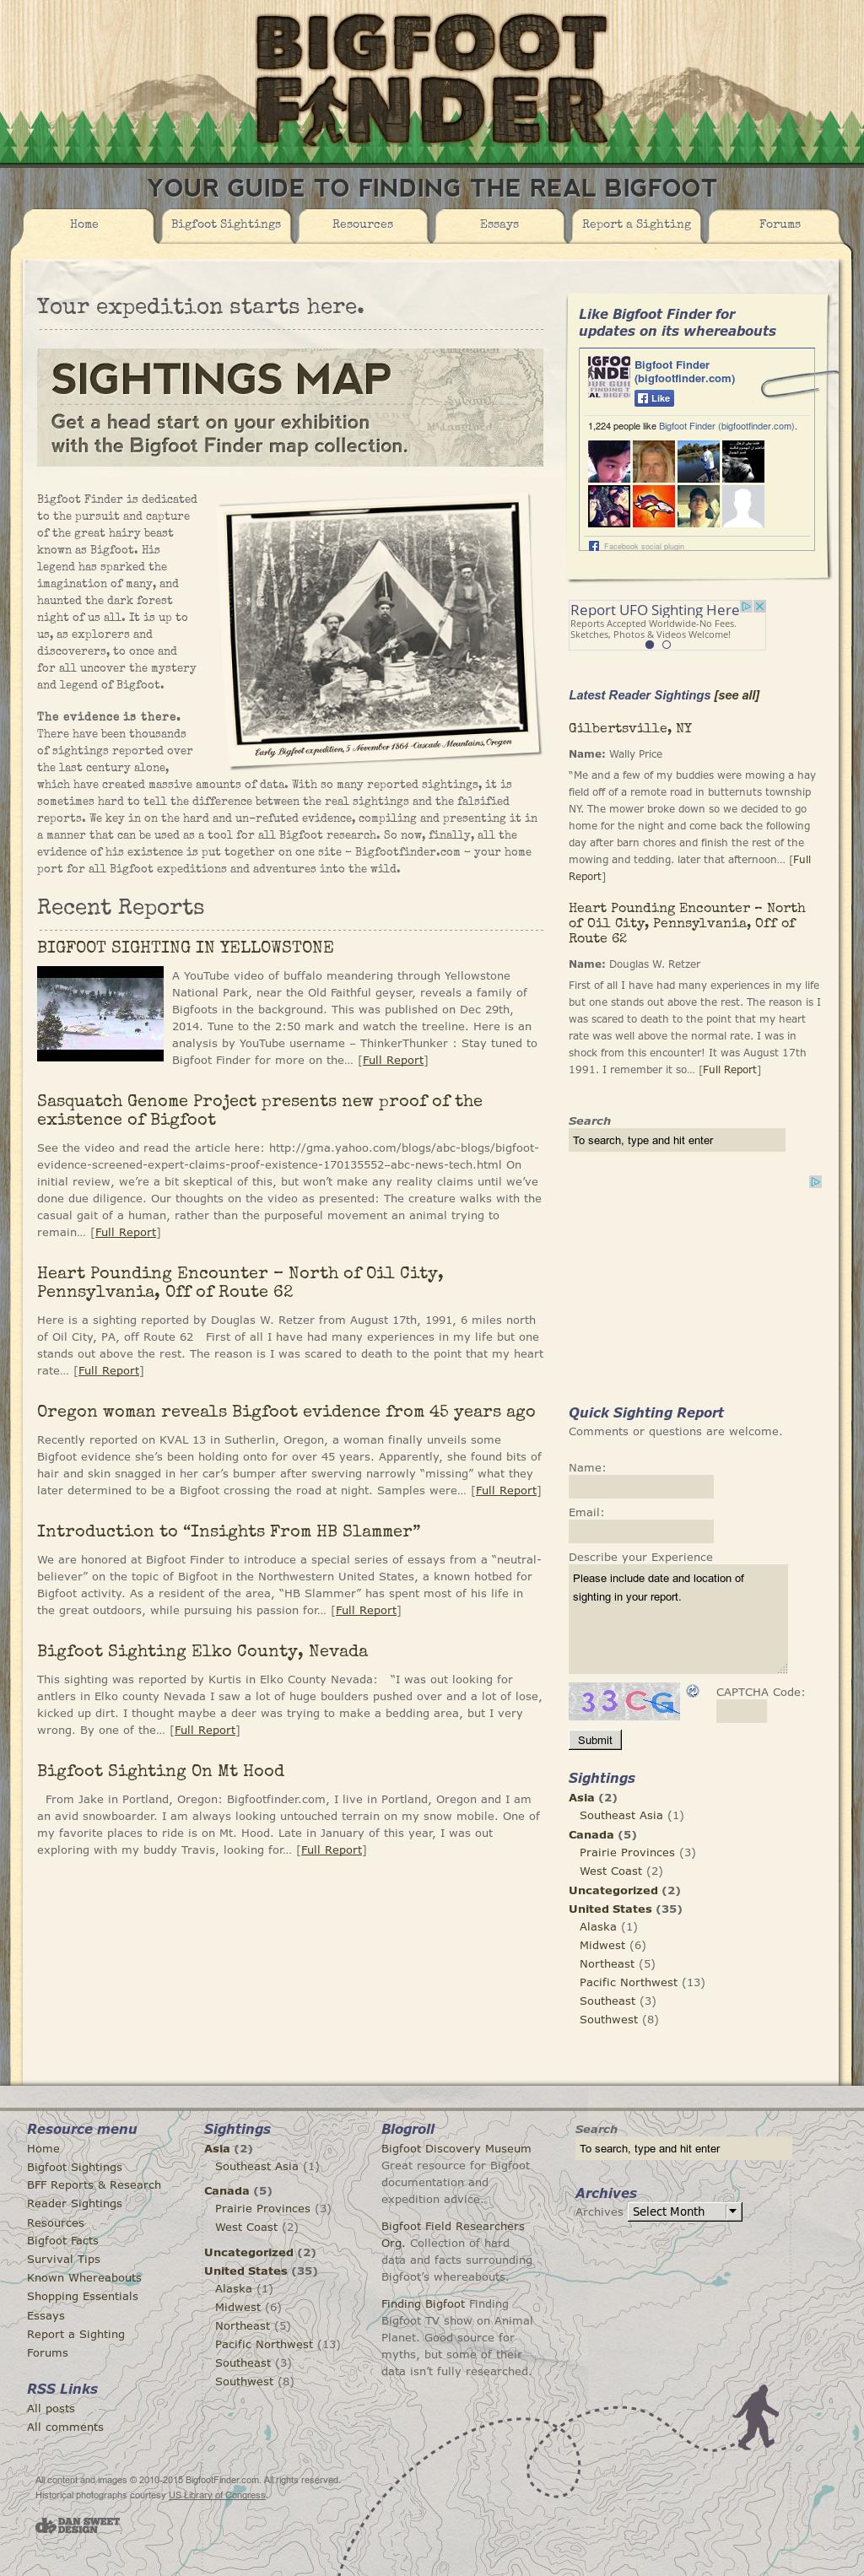 Bigfoot Finder (Bigfootfinder com) Competitors, Revenue and